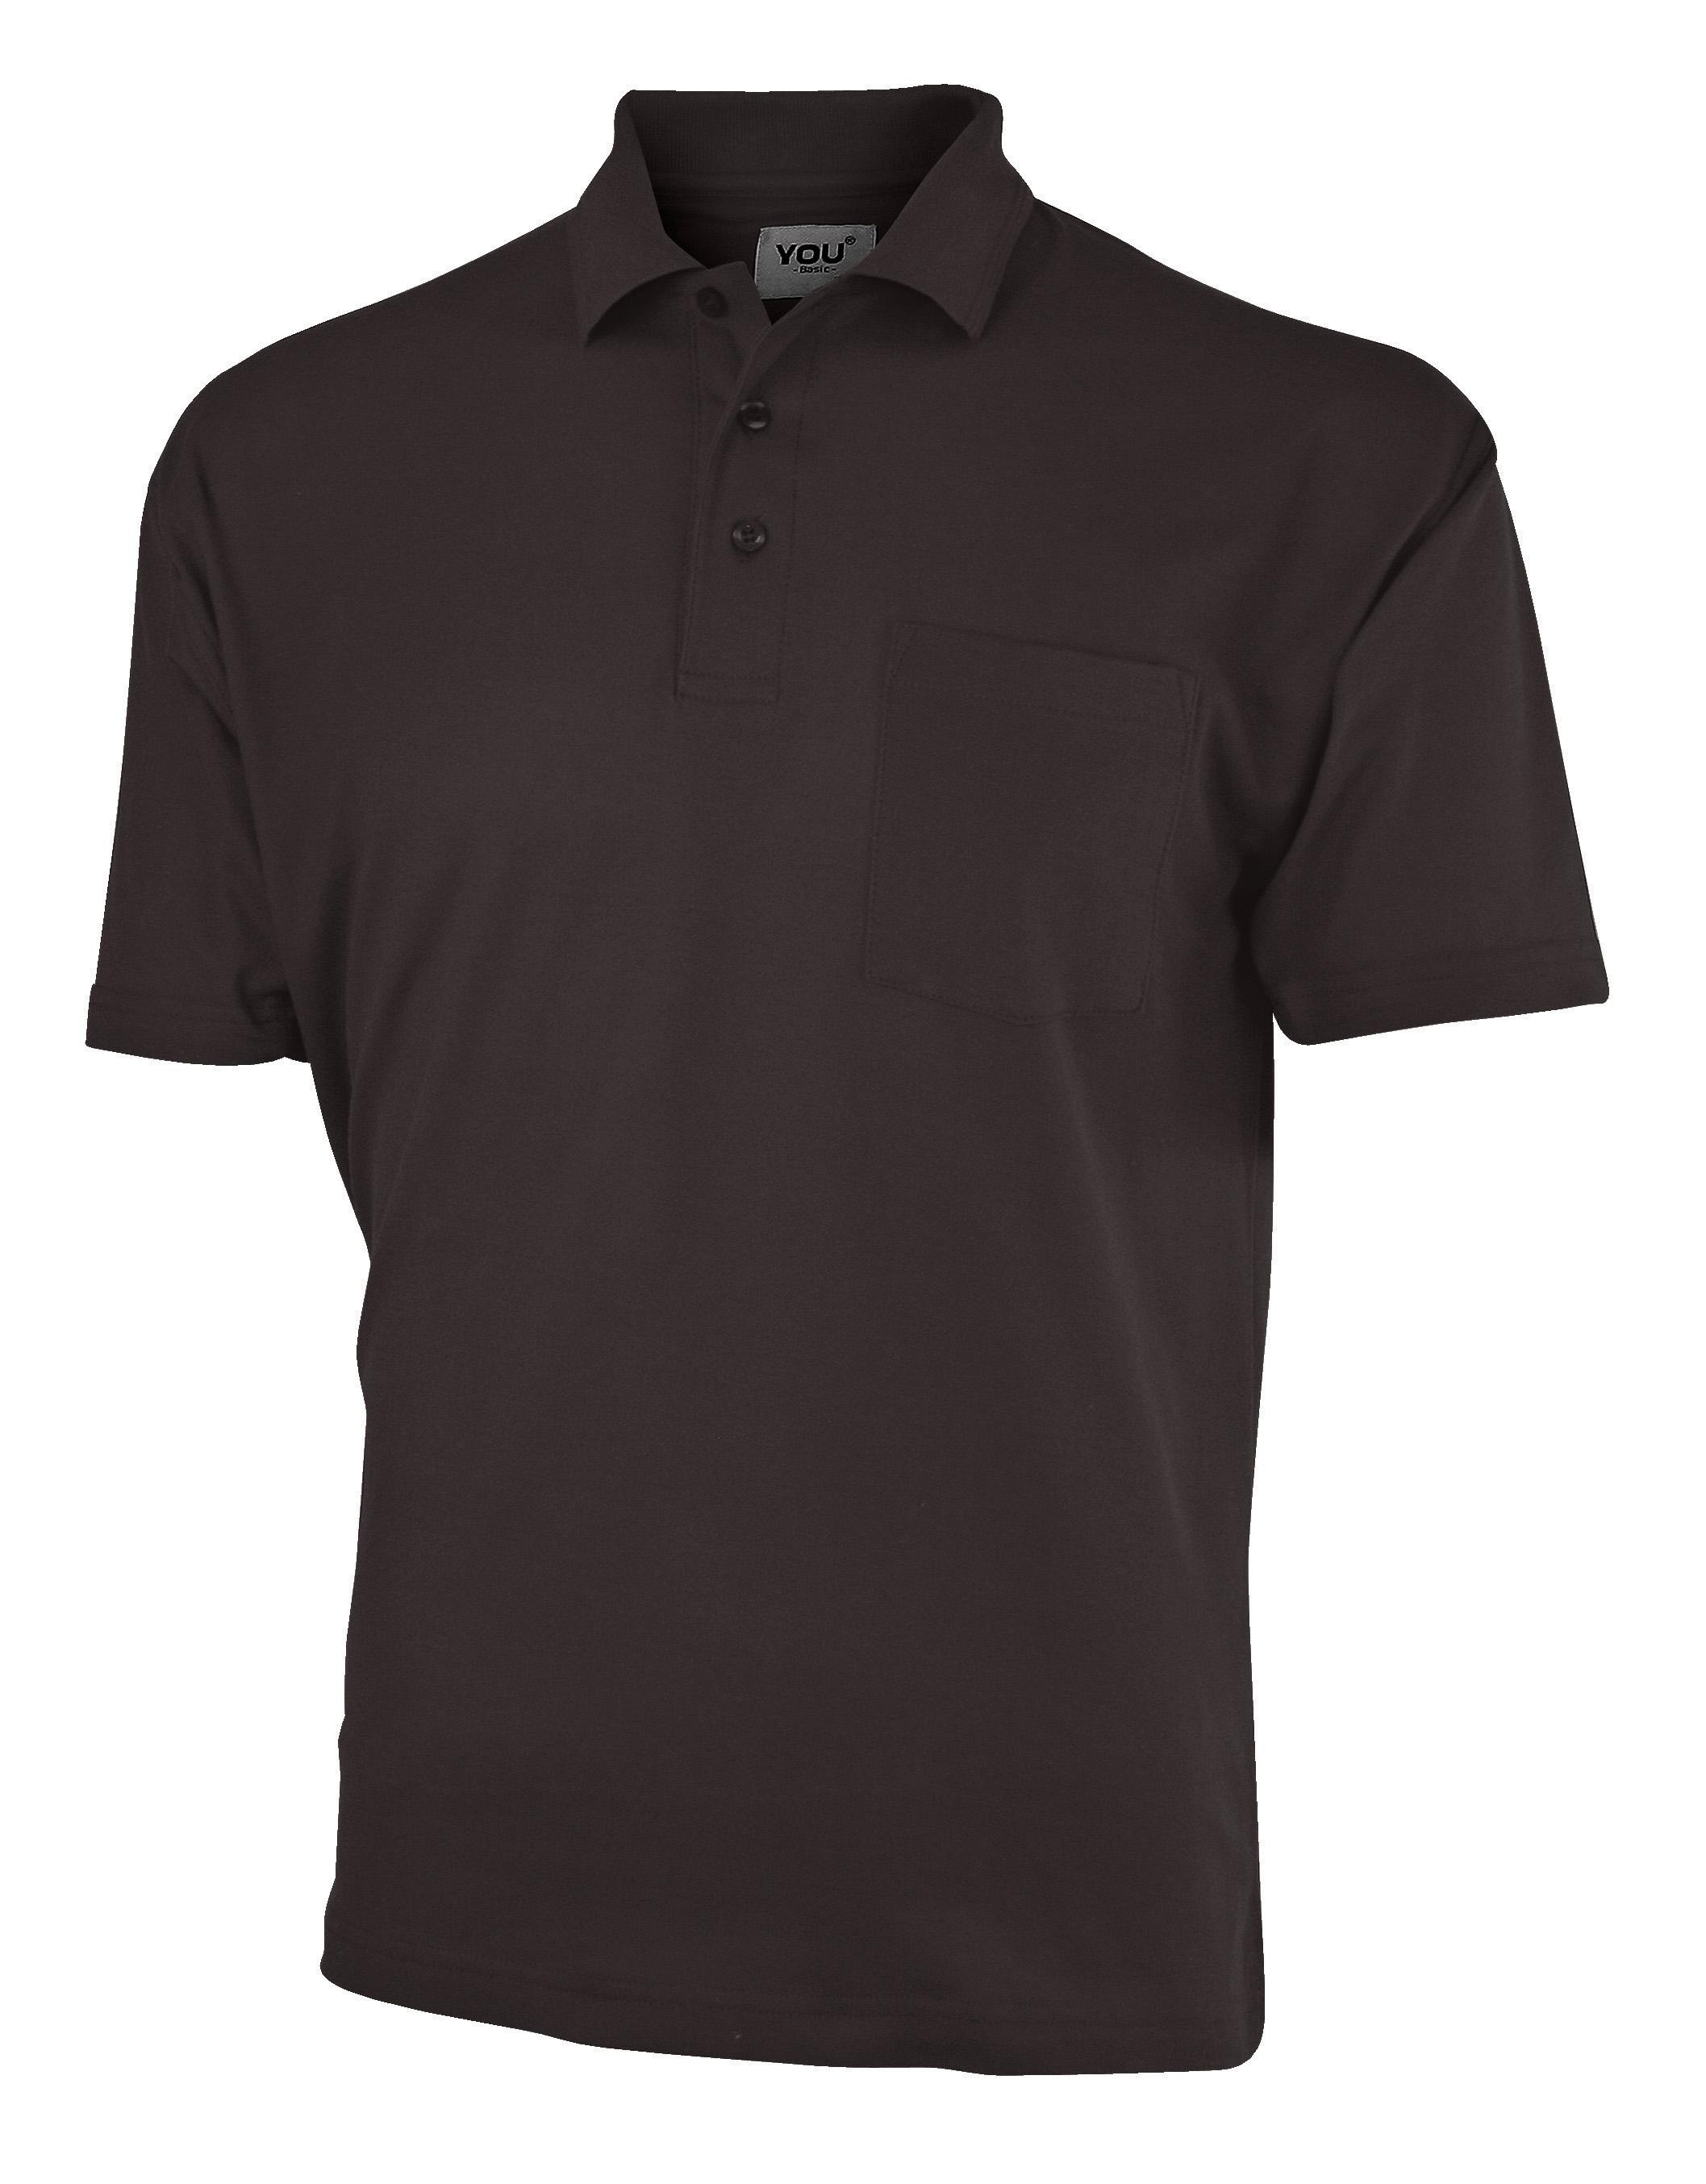 Pique shirts